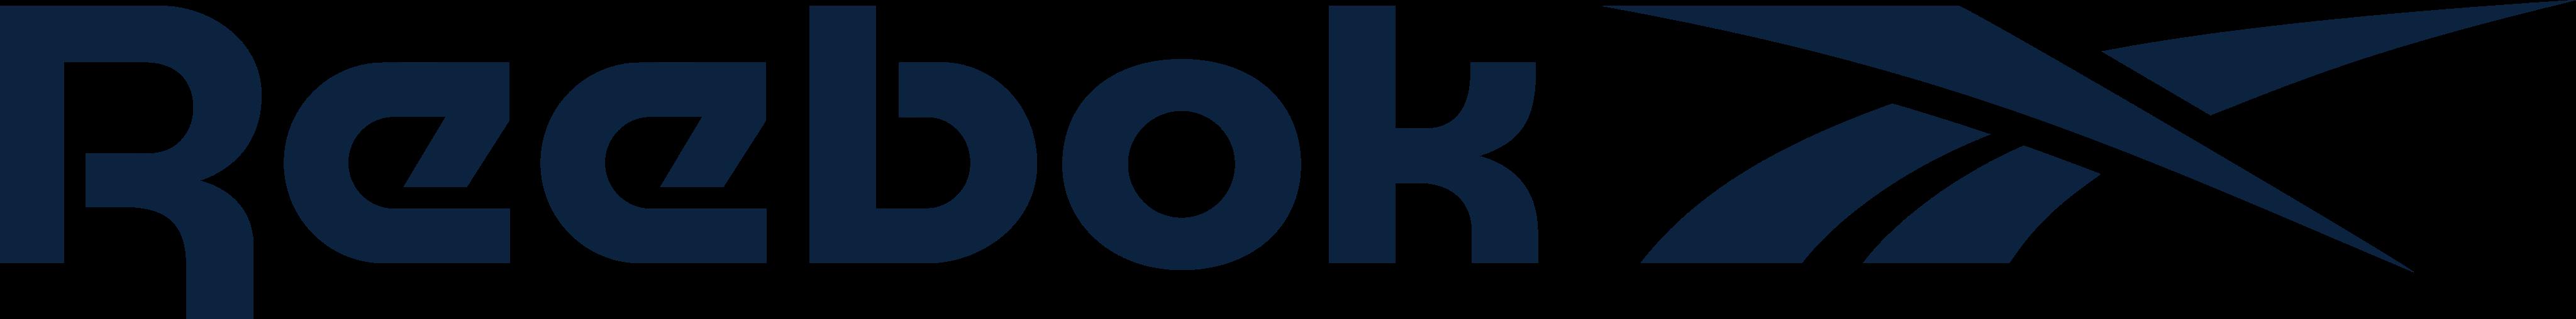 reebok logo 2 - Reebok Logo